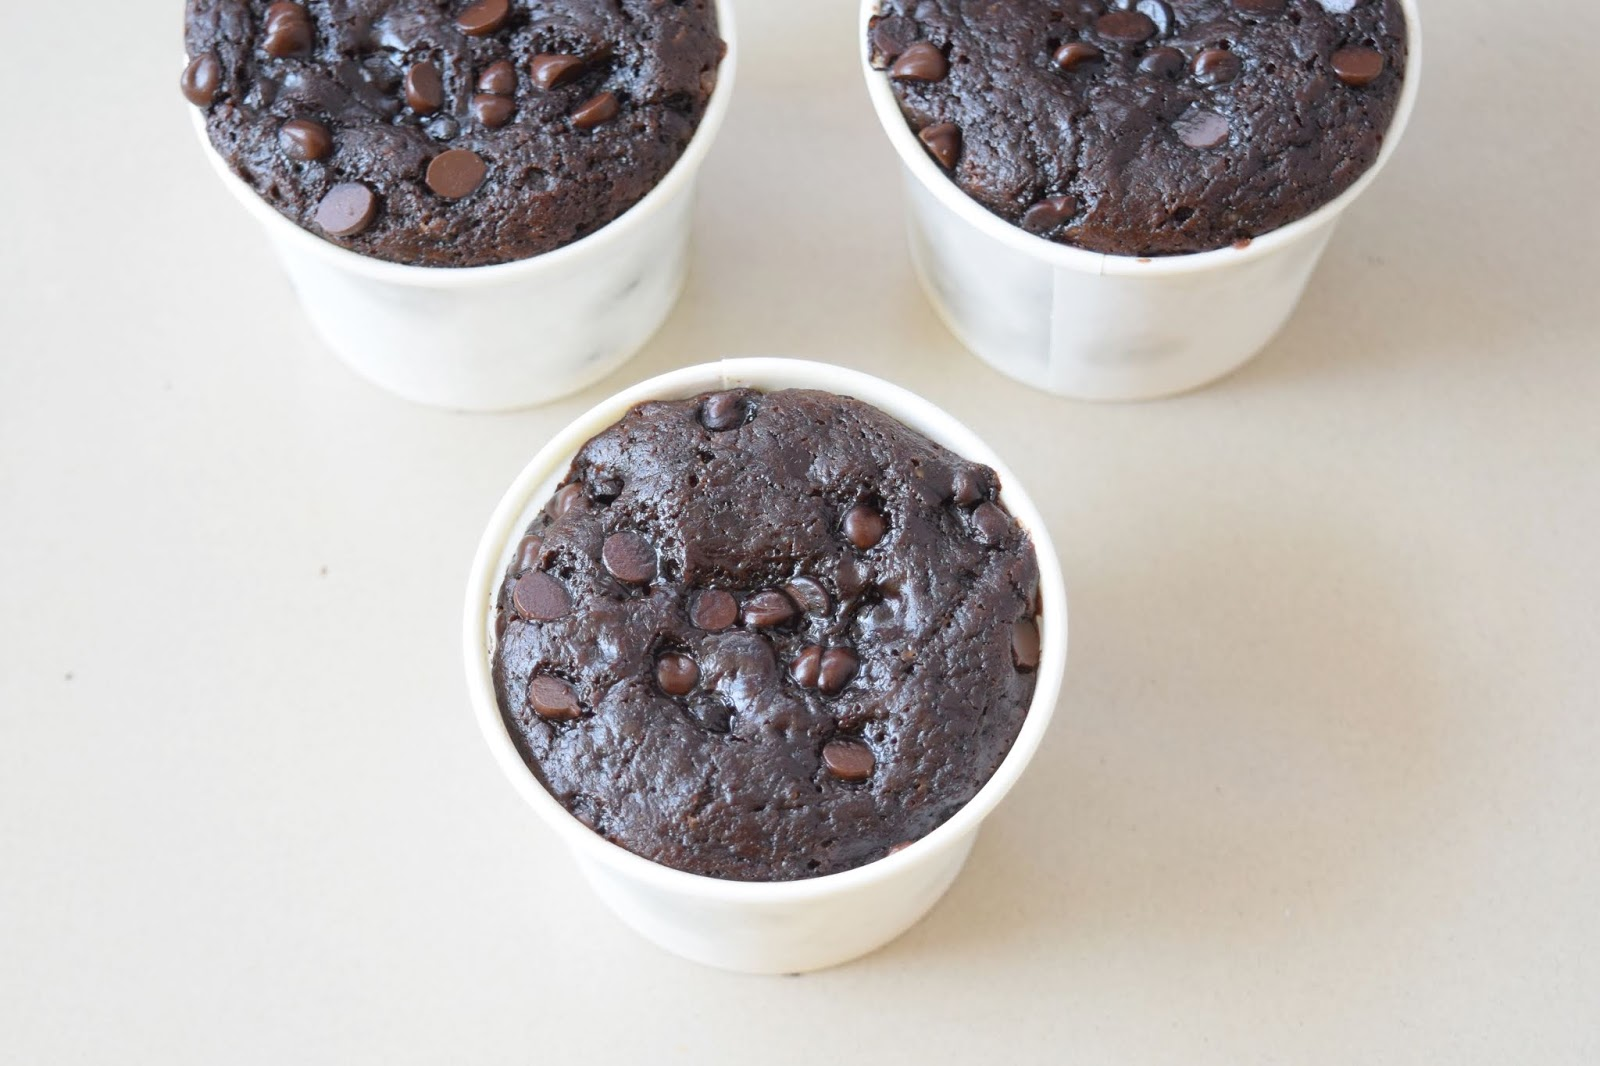 Double Chocolate Chips Cupcakes (Eggless) in Paper Cups & without Oven Recipe - पेपर कप और कड़ाई में बनाये एग्ग्लेस चॉकलेट चिप्स कपकेक्स  - Priya R - Magic of Indian Rasoi